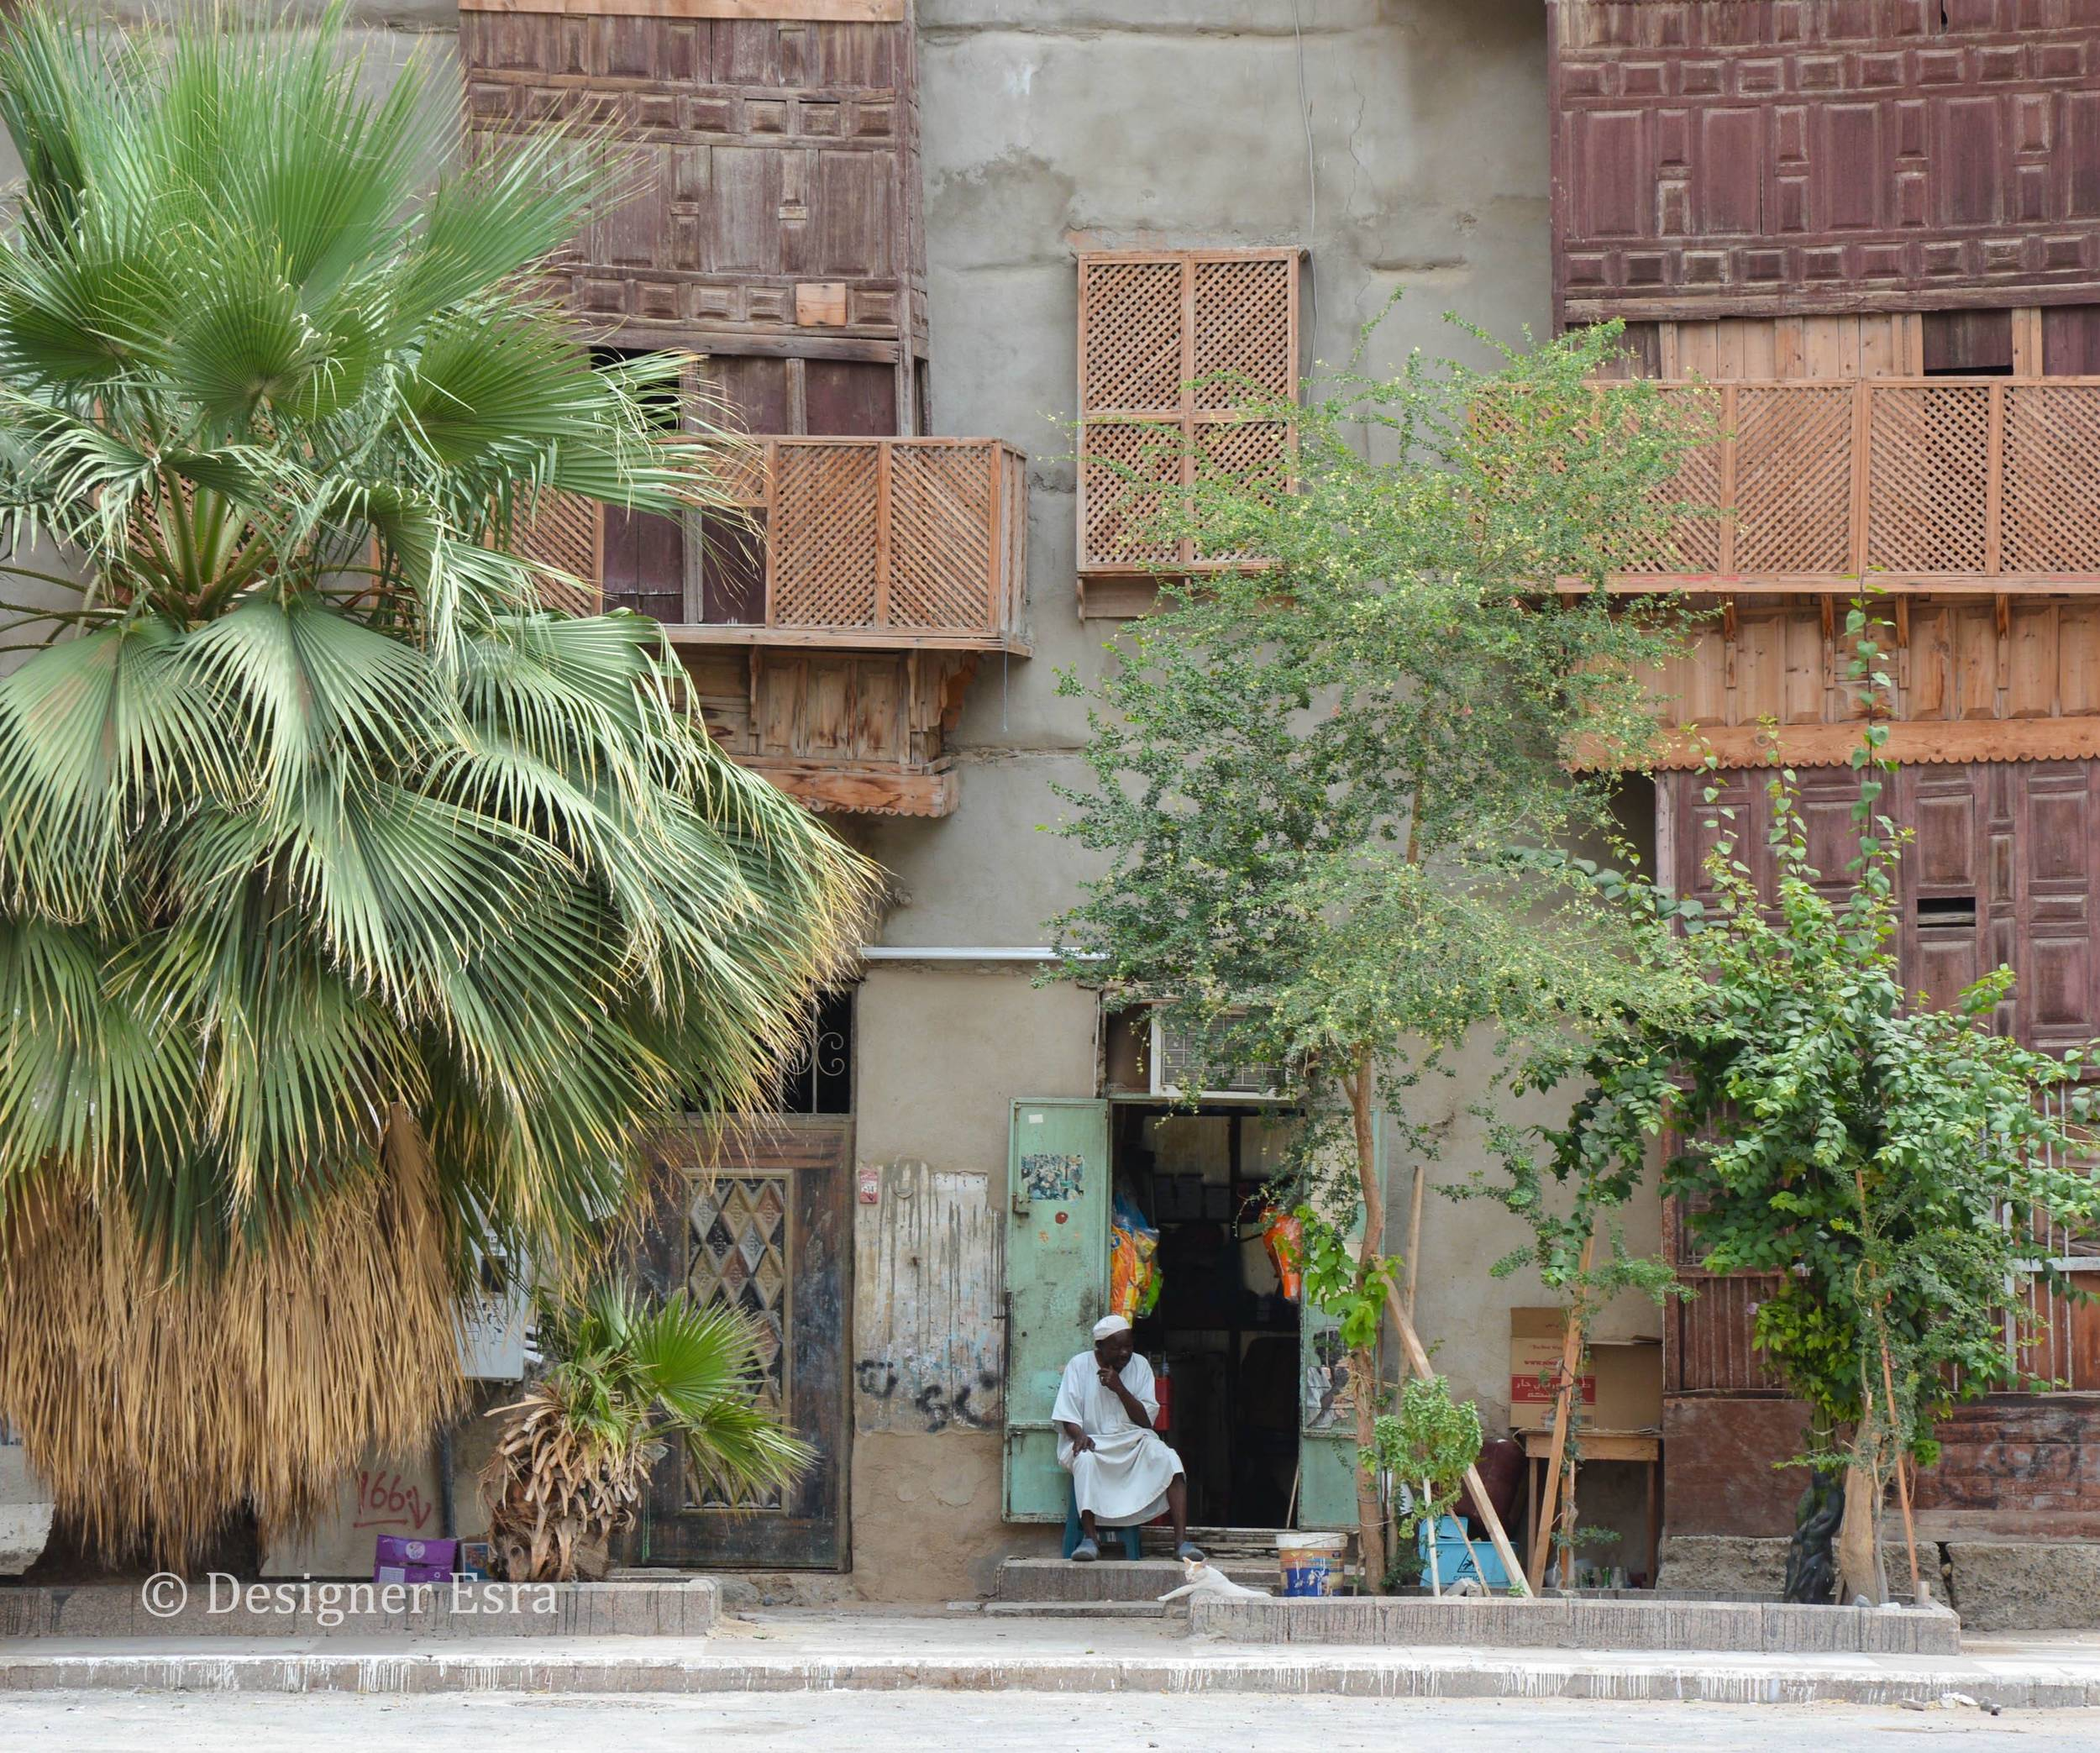 Historic Jeddah, AlBalad - جدة القديمة البلد